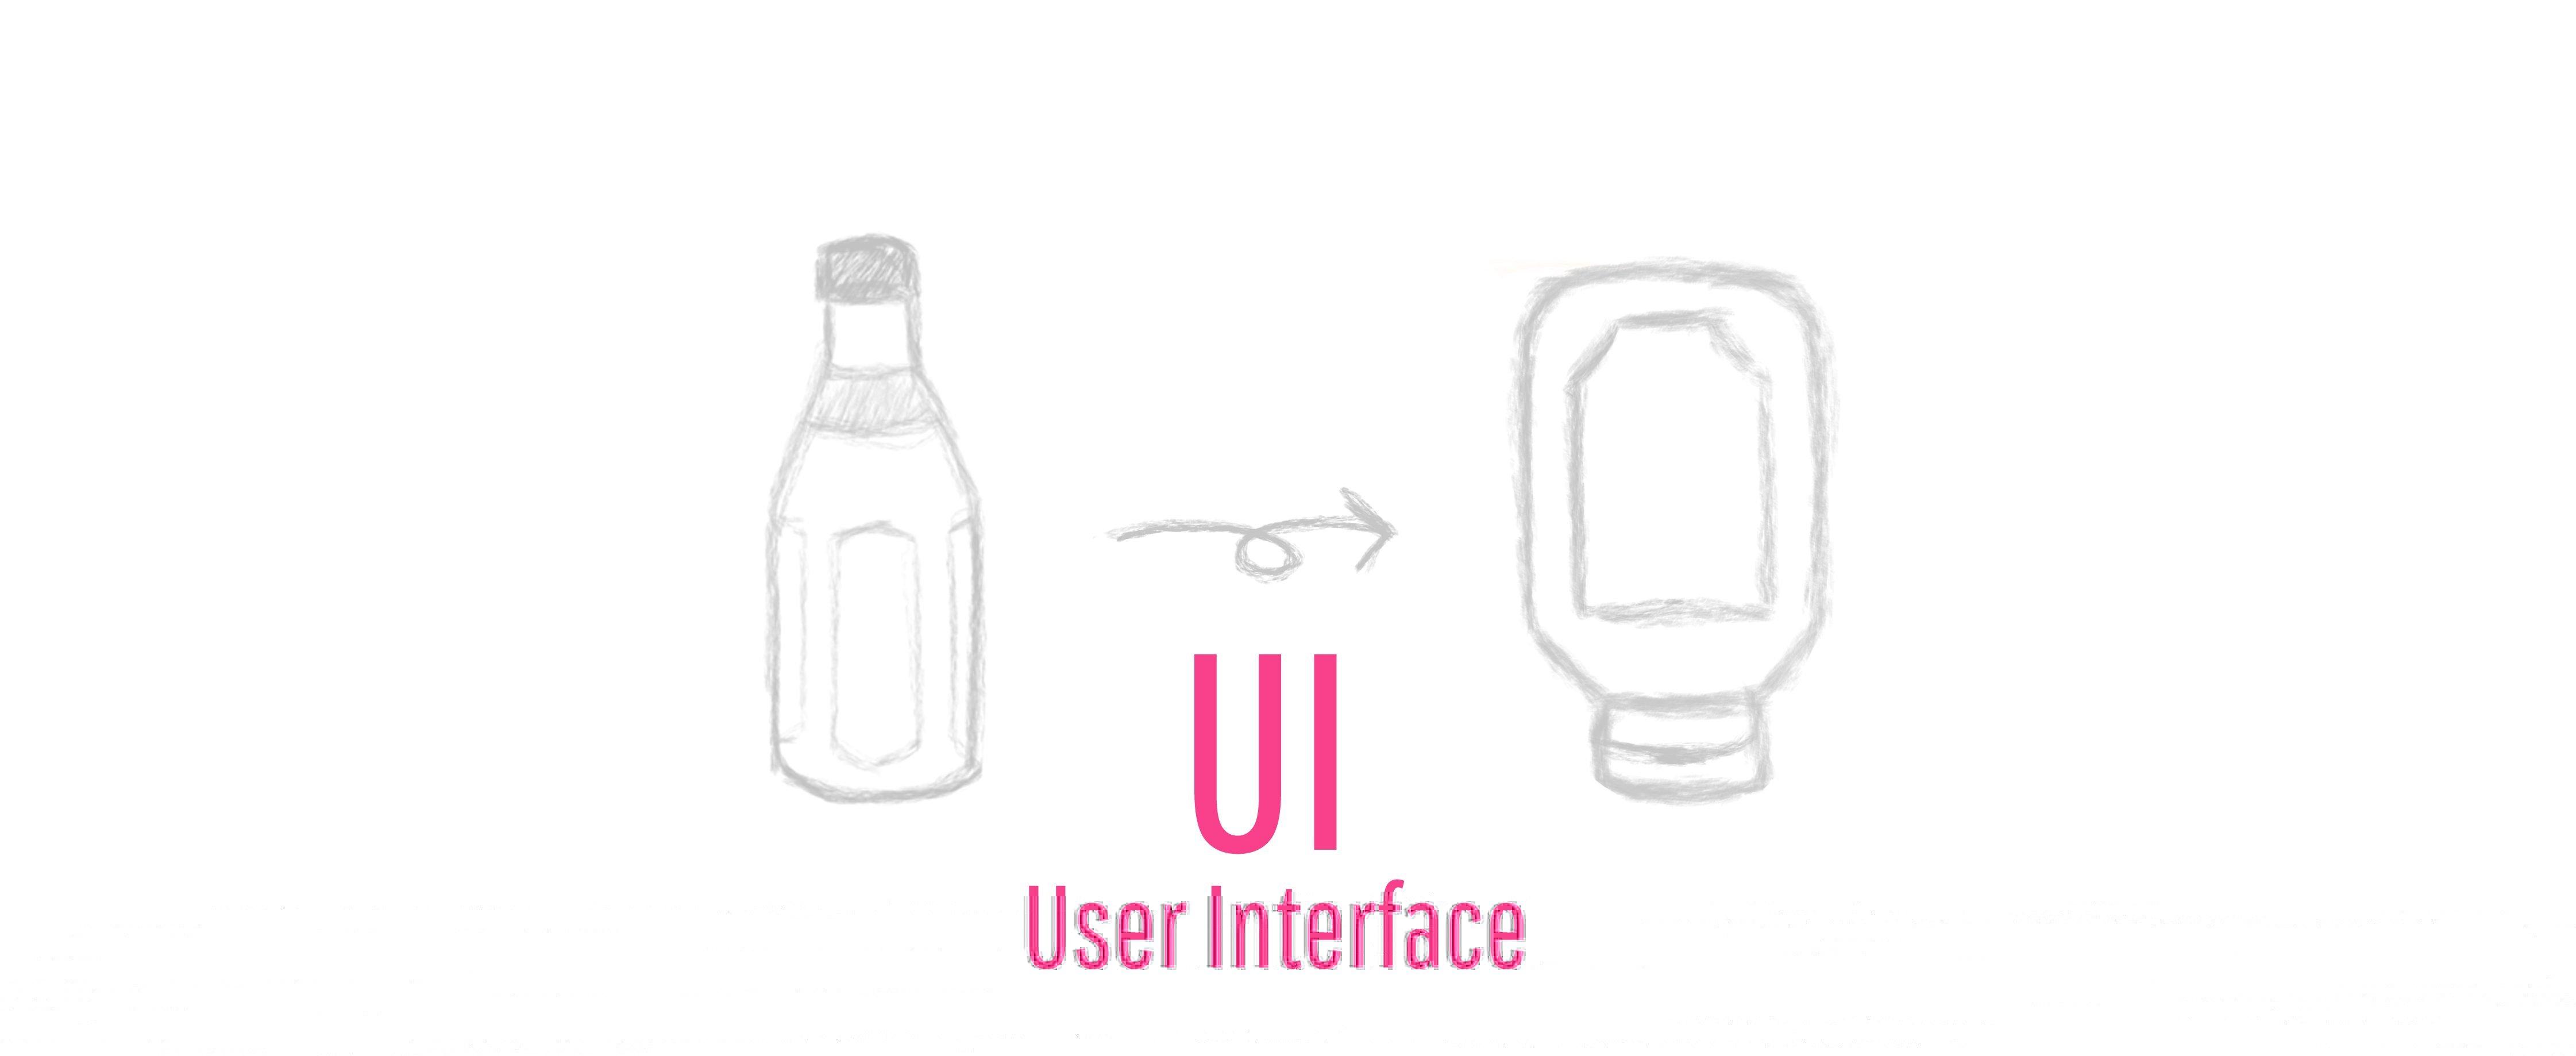 UI คืออะไร จำเป็นแค่ไหนการดีไซน์เว็บ UI e1522049396518 สิ่งที่ต้องรู้ เกี่ยวกับ UX/UI คืออะไร จำเป็นแค่ไหนการดีไซน์เว็บ